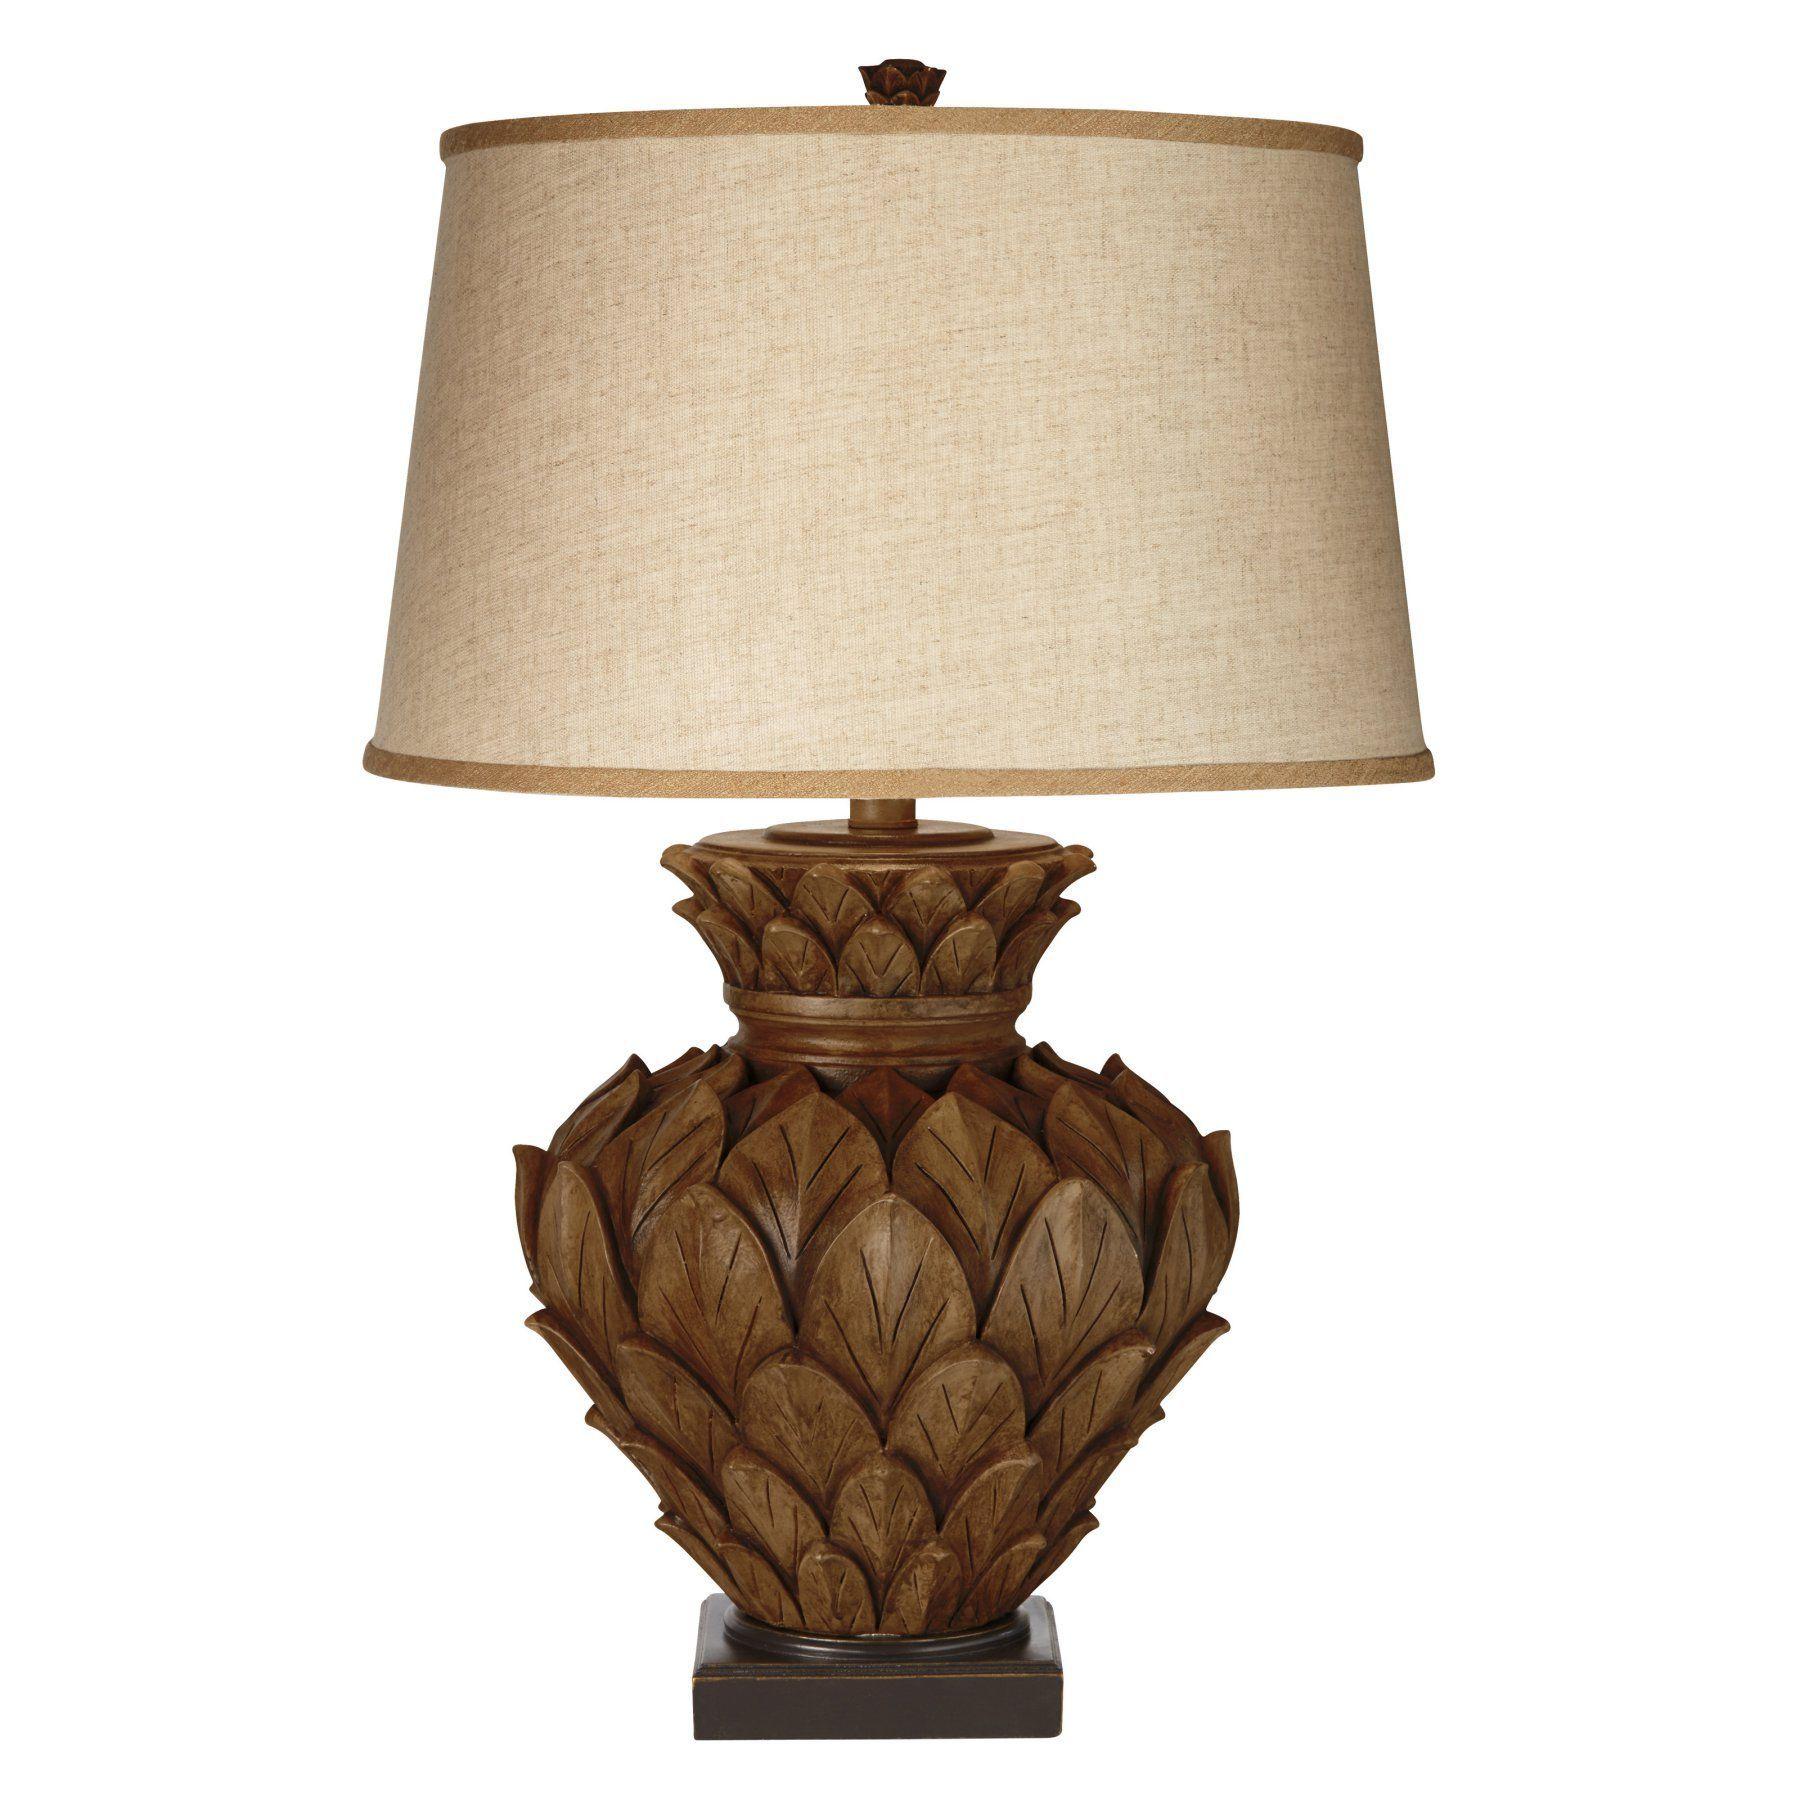 rushall store heron lamp for pacific sale rare coast table lighting light